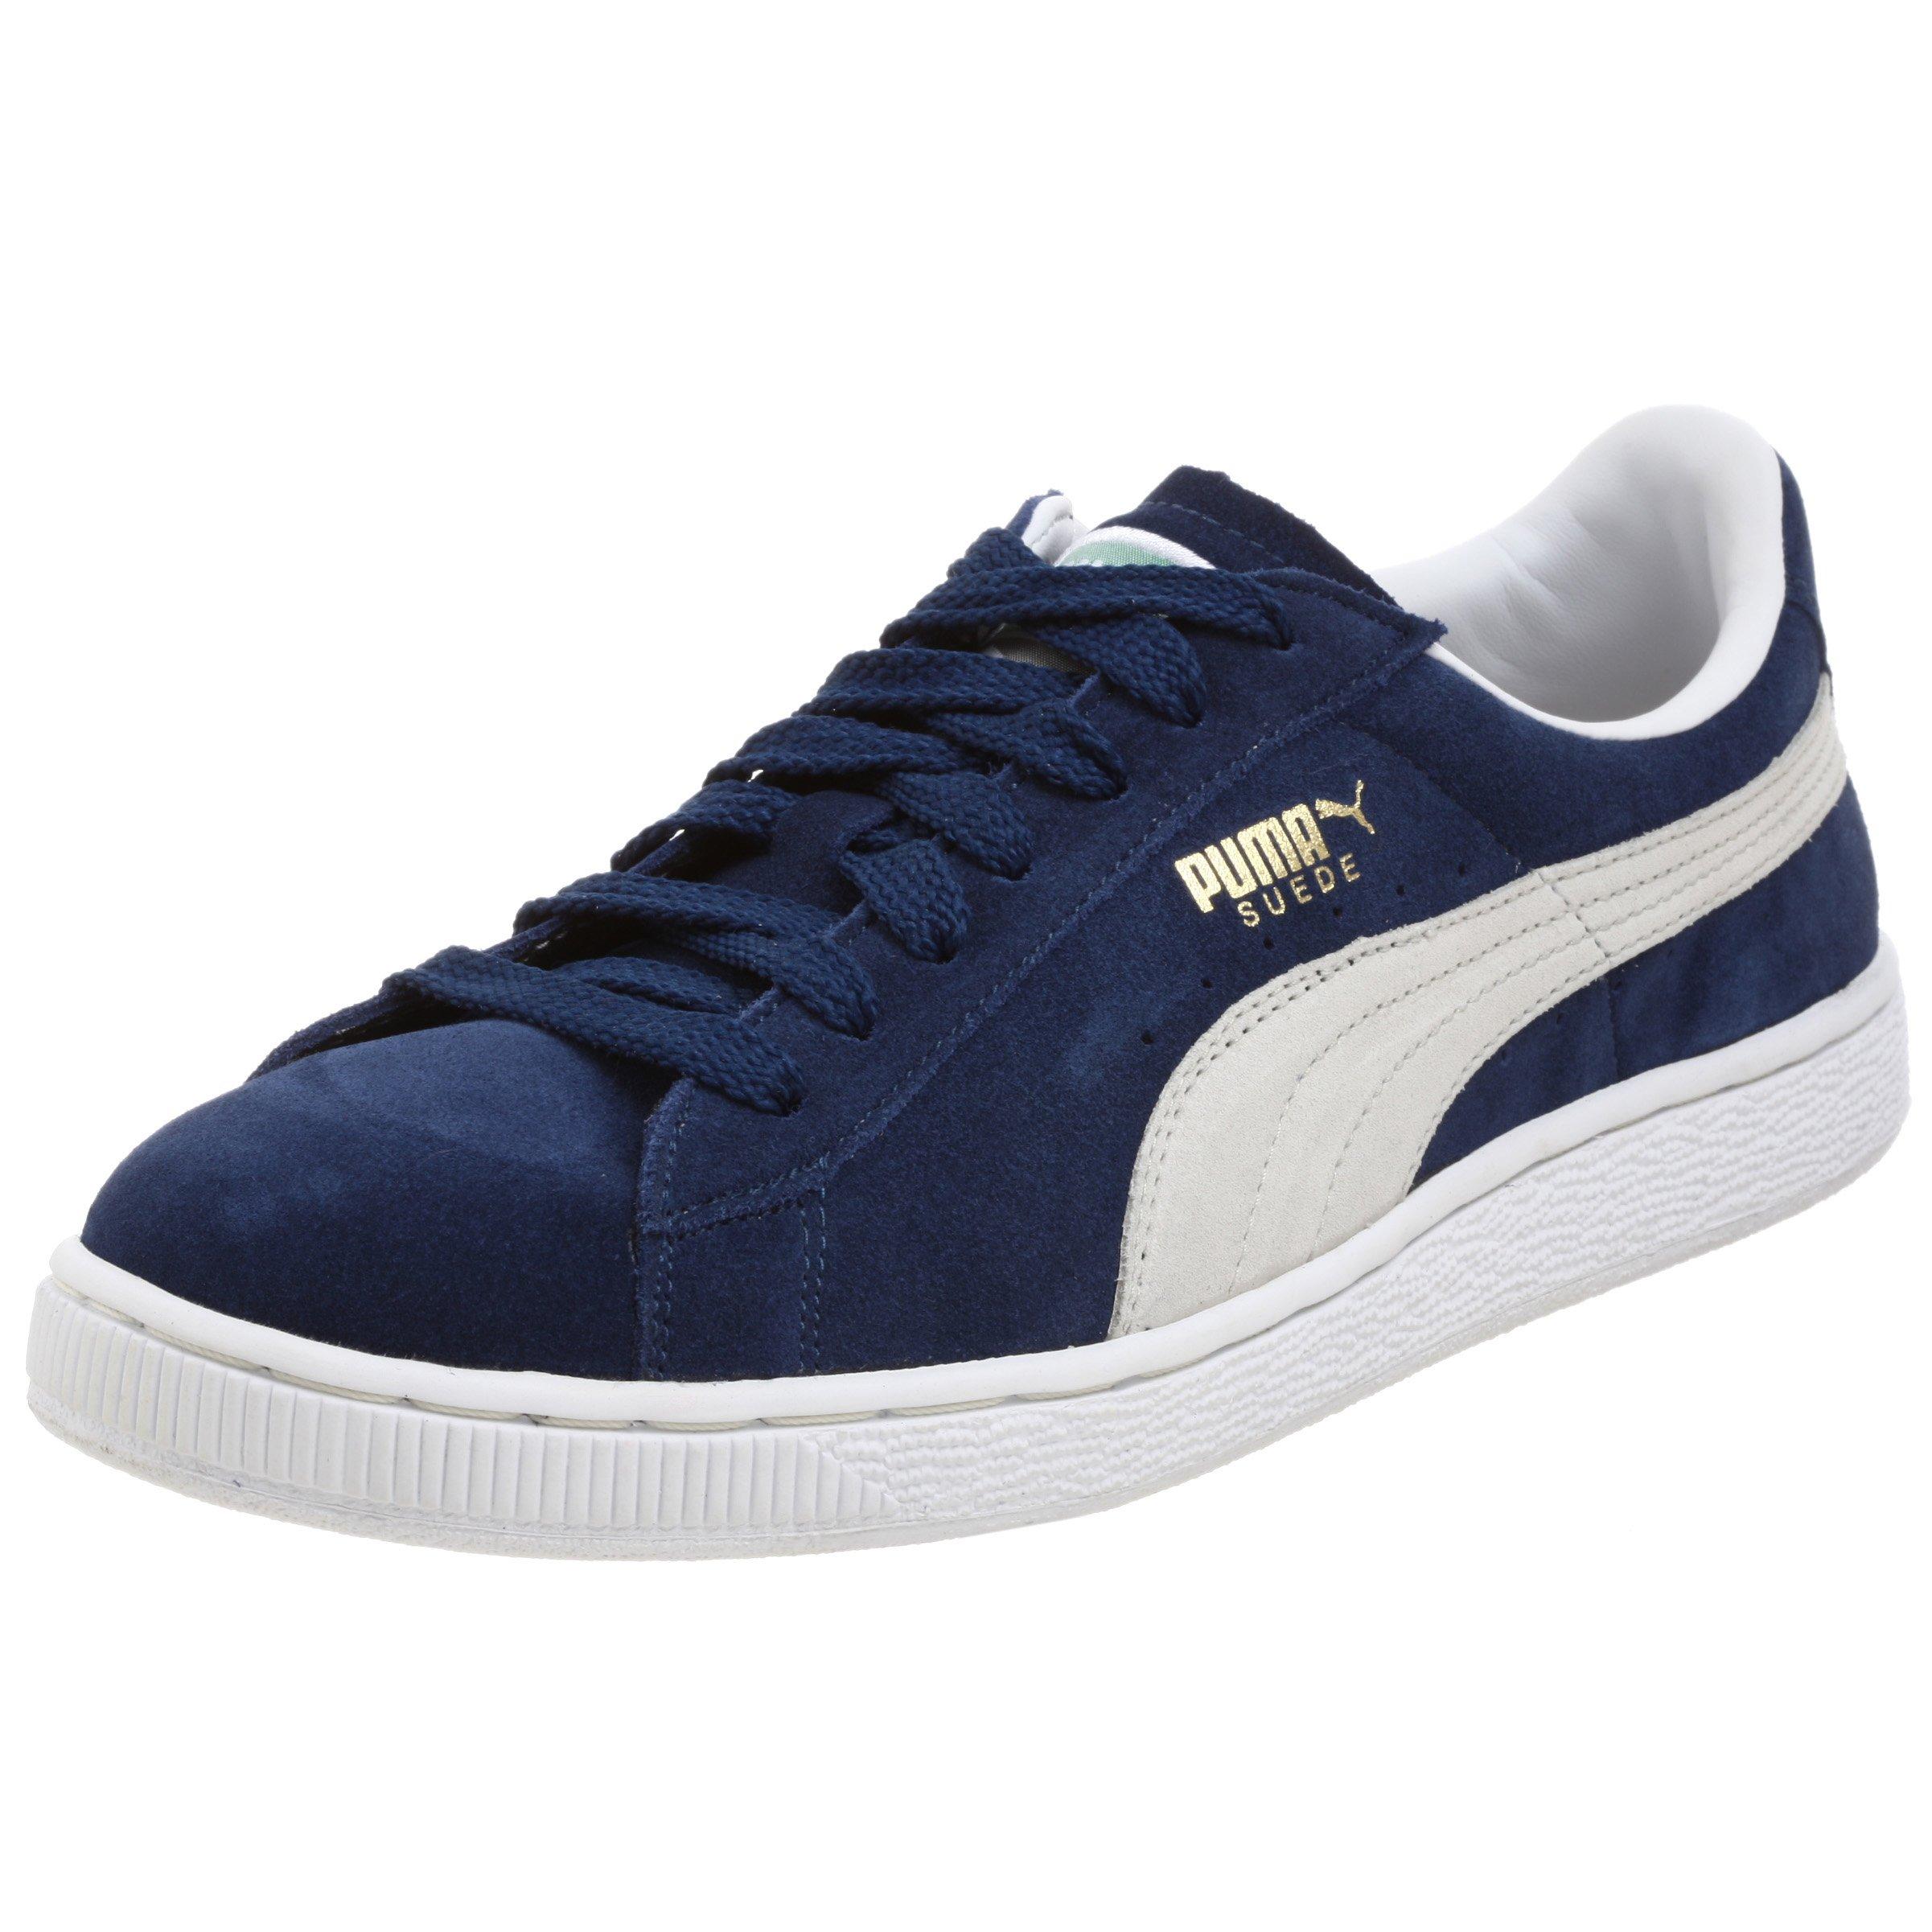 PUMA Suede Classic Sneaker,Blue/White,8 M US Men's by PUMA (Image #1)